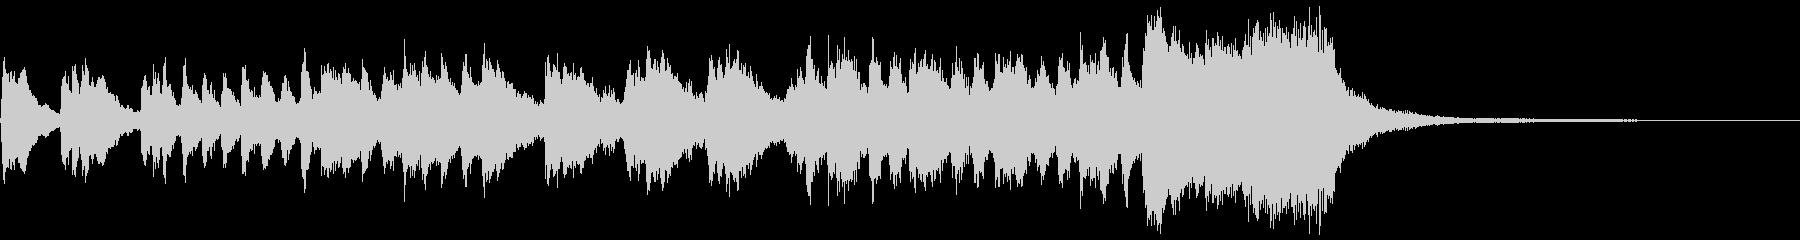 William Tell Overture (excerpt)'s unreproduced waveform